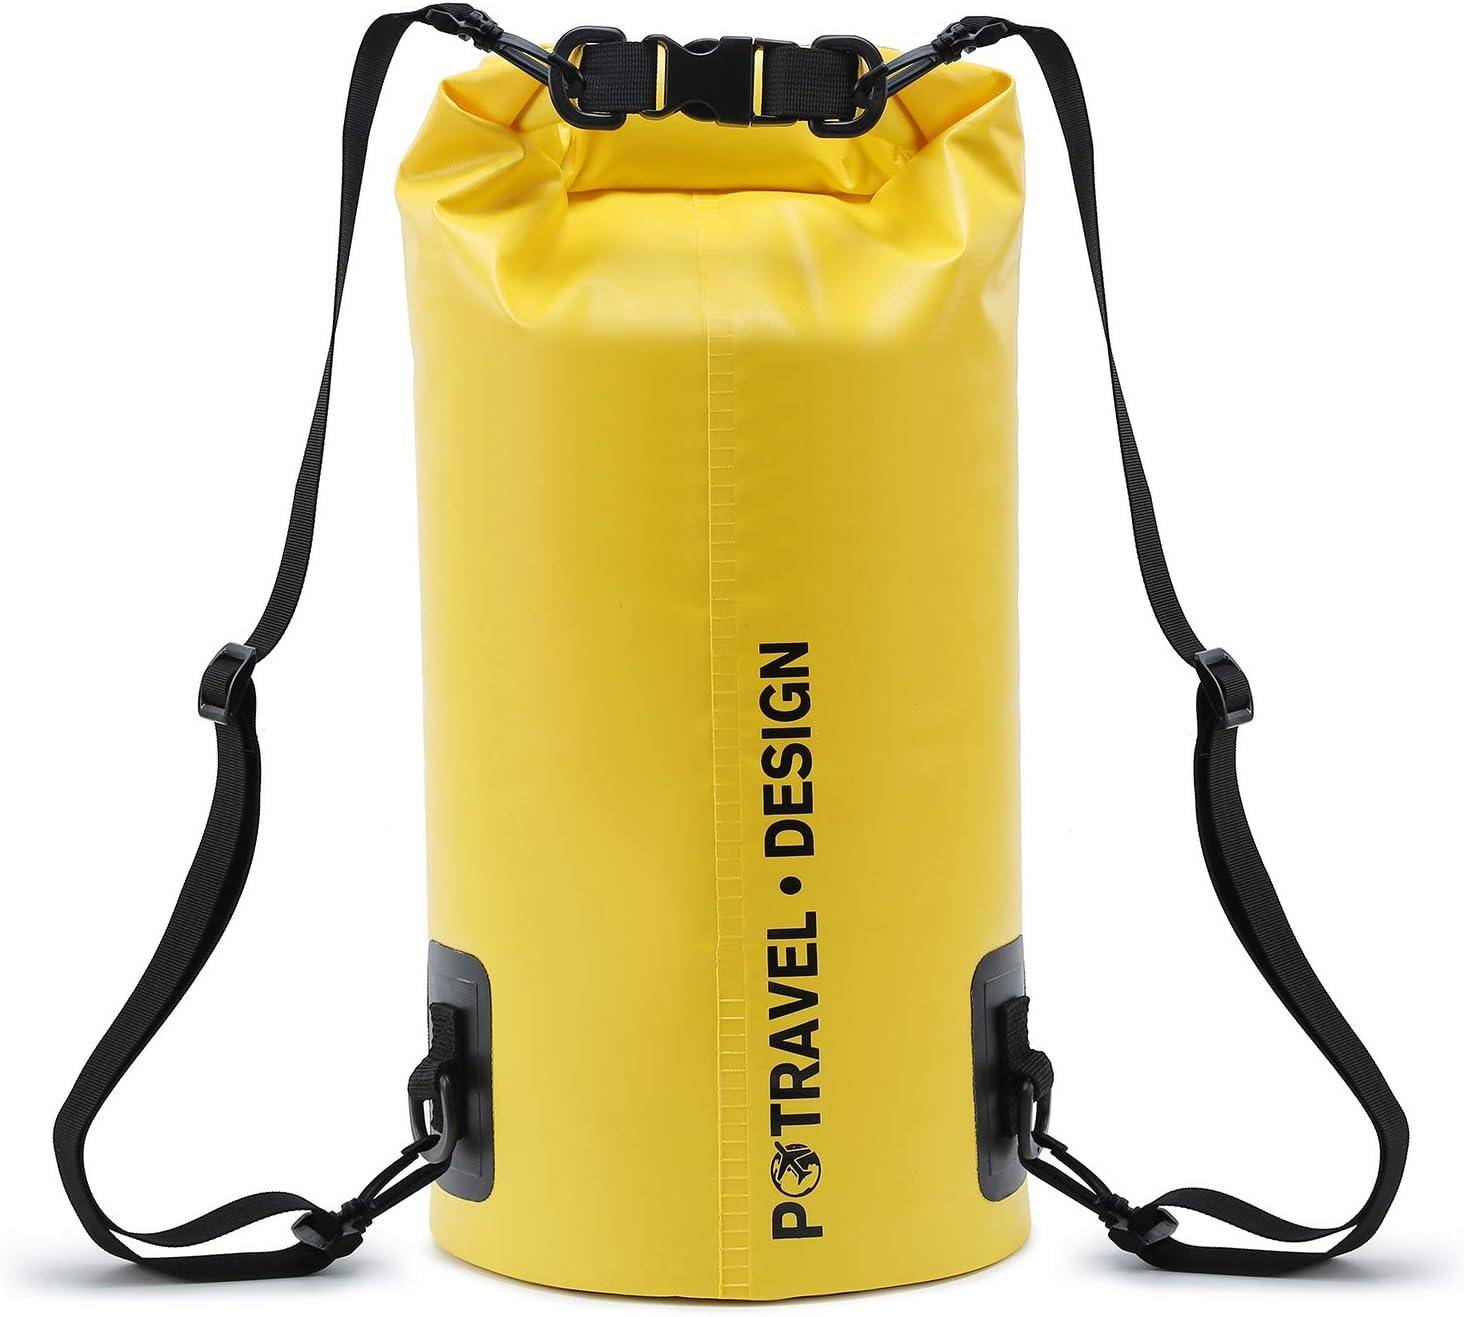 Gsultron Swimming Rafting Bag PVC Waterproof Backpack Travel Storage Beach Bag Outdoor Pool Drifting Kayak Gear